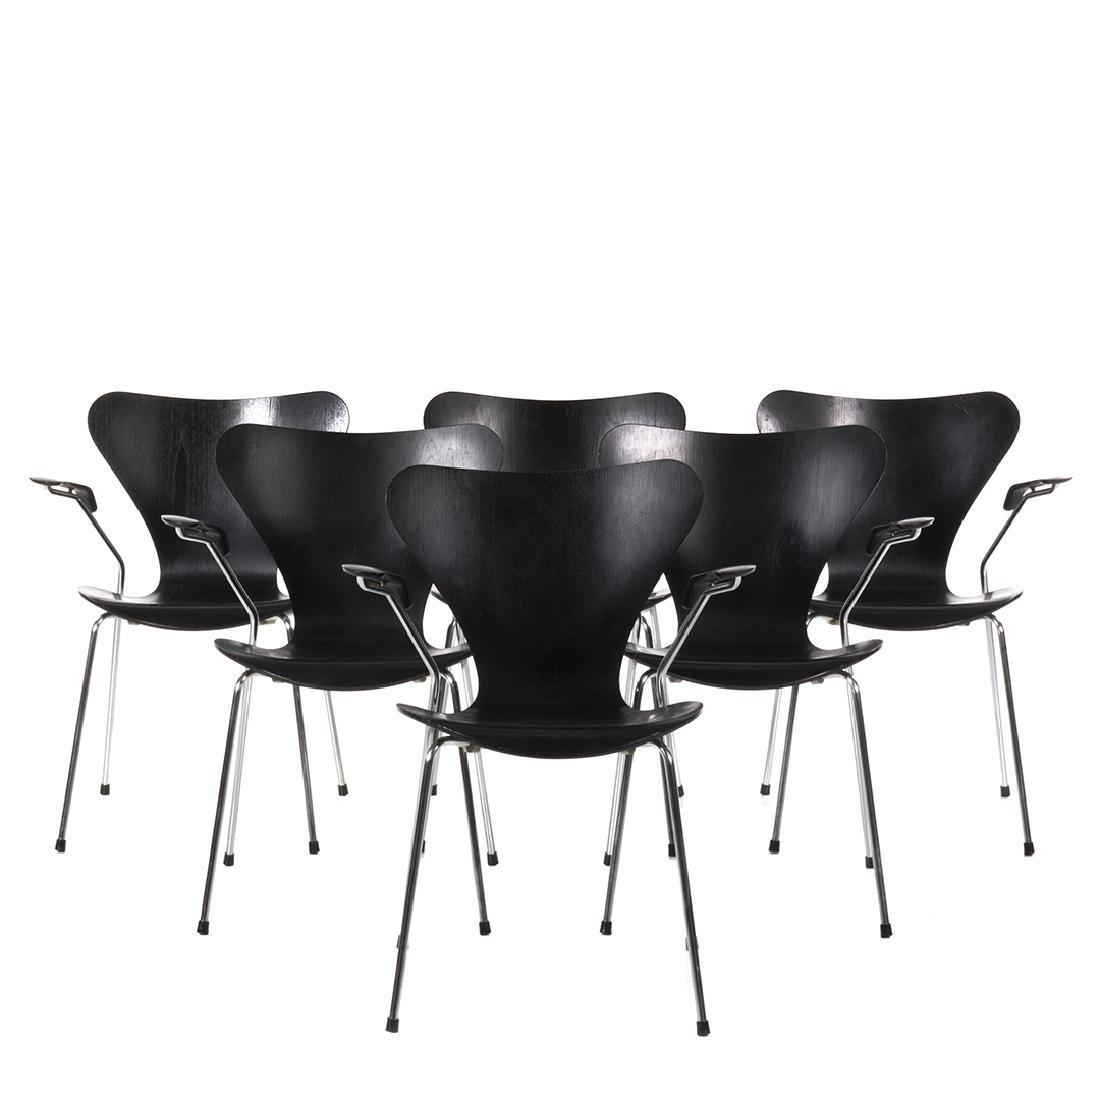 Arne Jacobsen Armchairs (6)